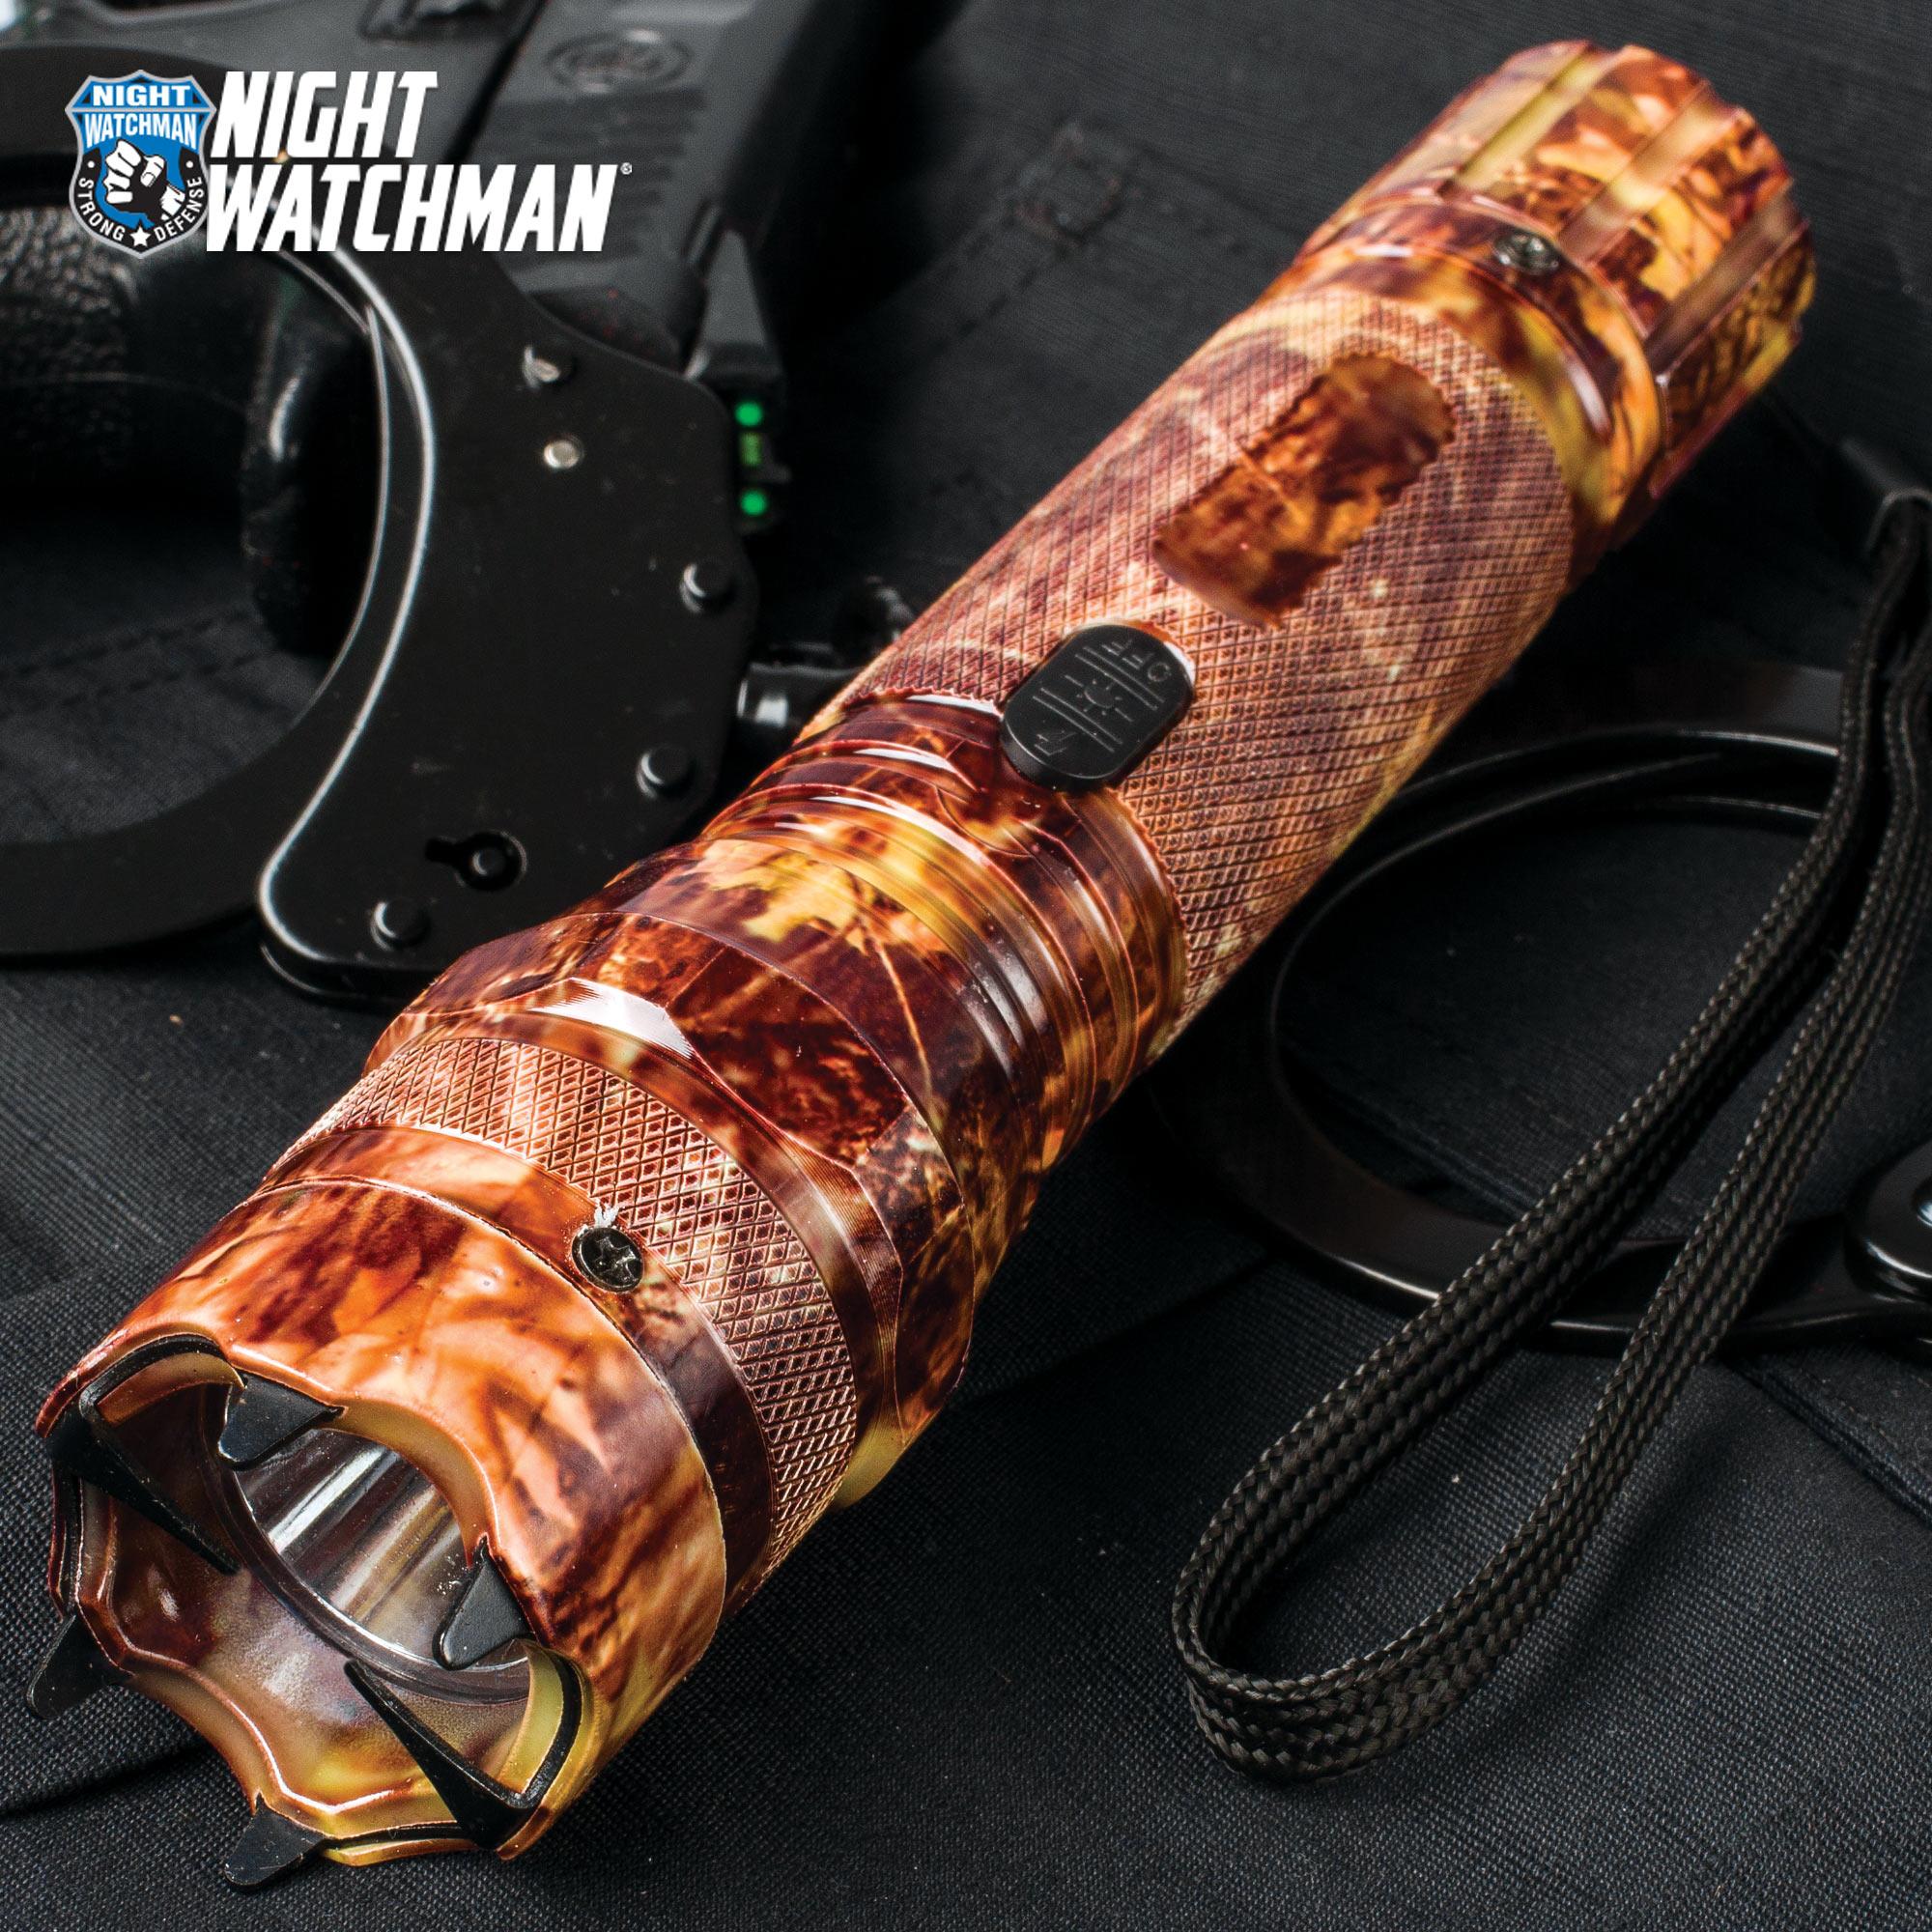 Night Watchman 2 Million Volt Stun Gun Led Flashlight Combo High Voltage Touch To Zoom